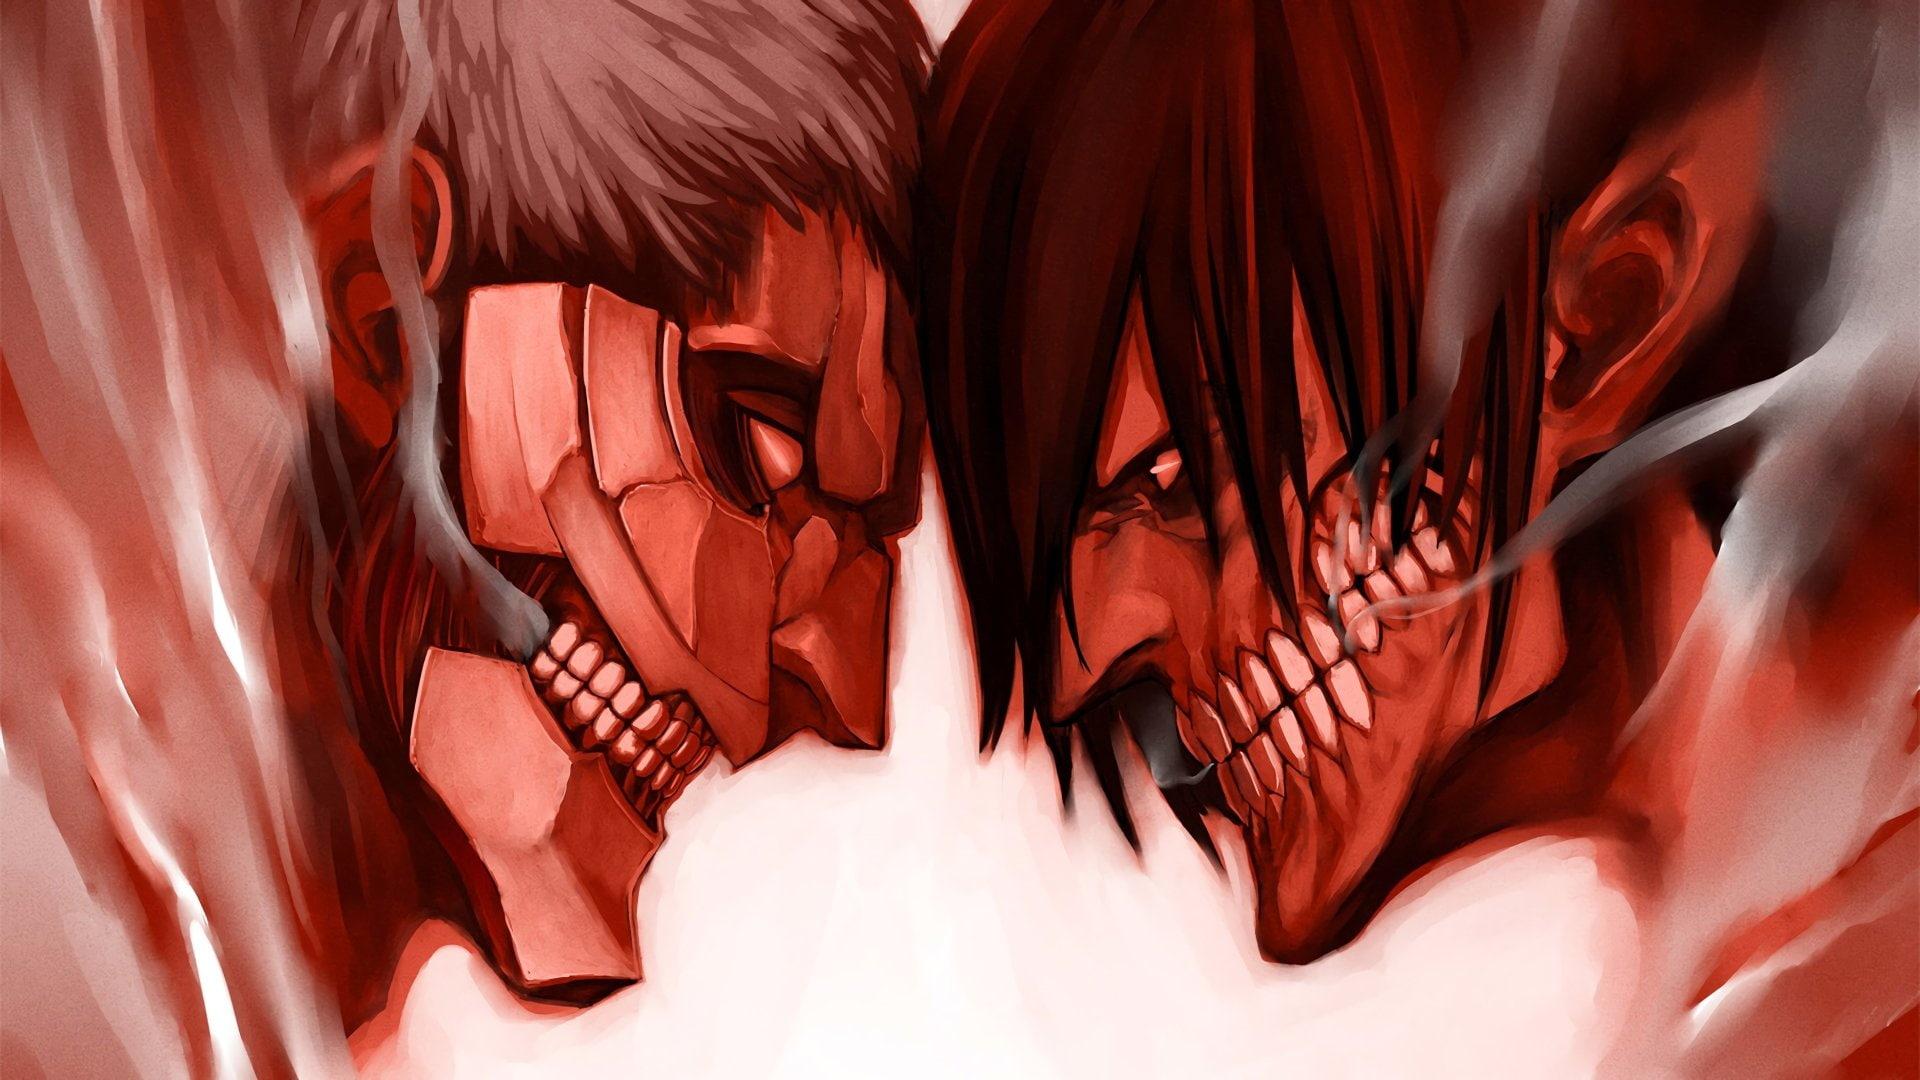 Levi attack on titan shingeki no kyojin 4k wallpaper 3840x2160. Wallpaper Hd Eren